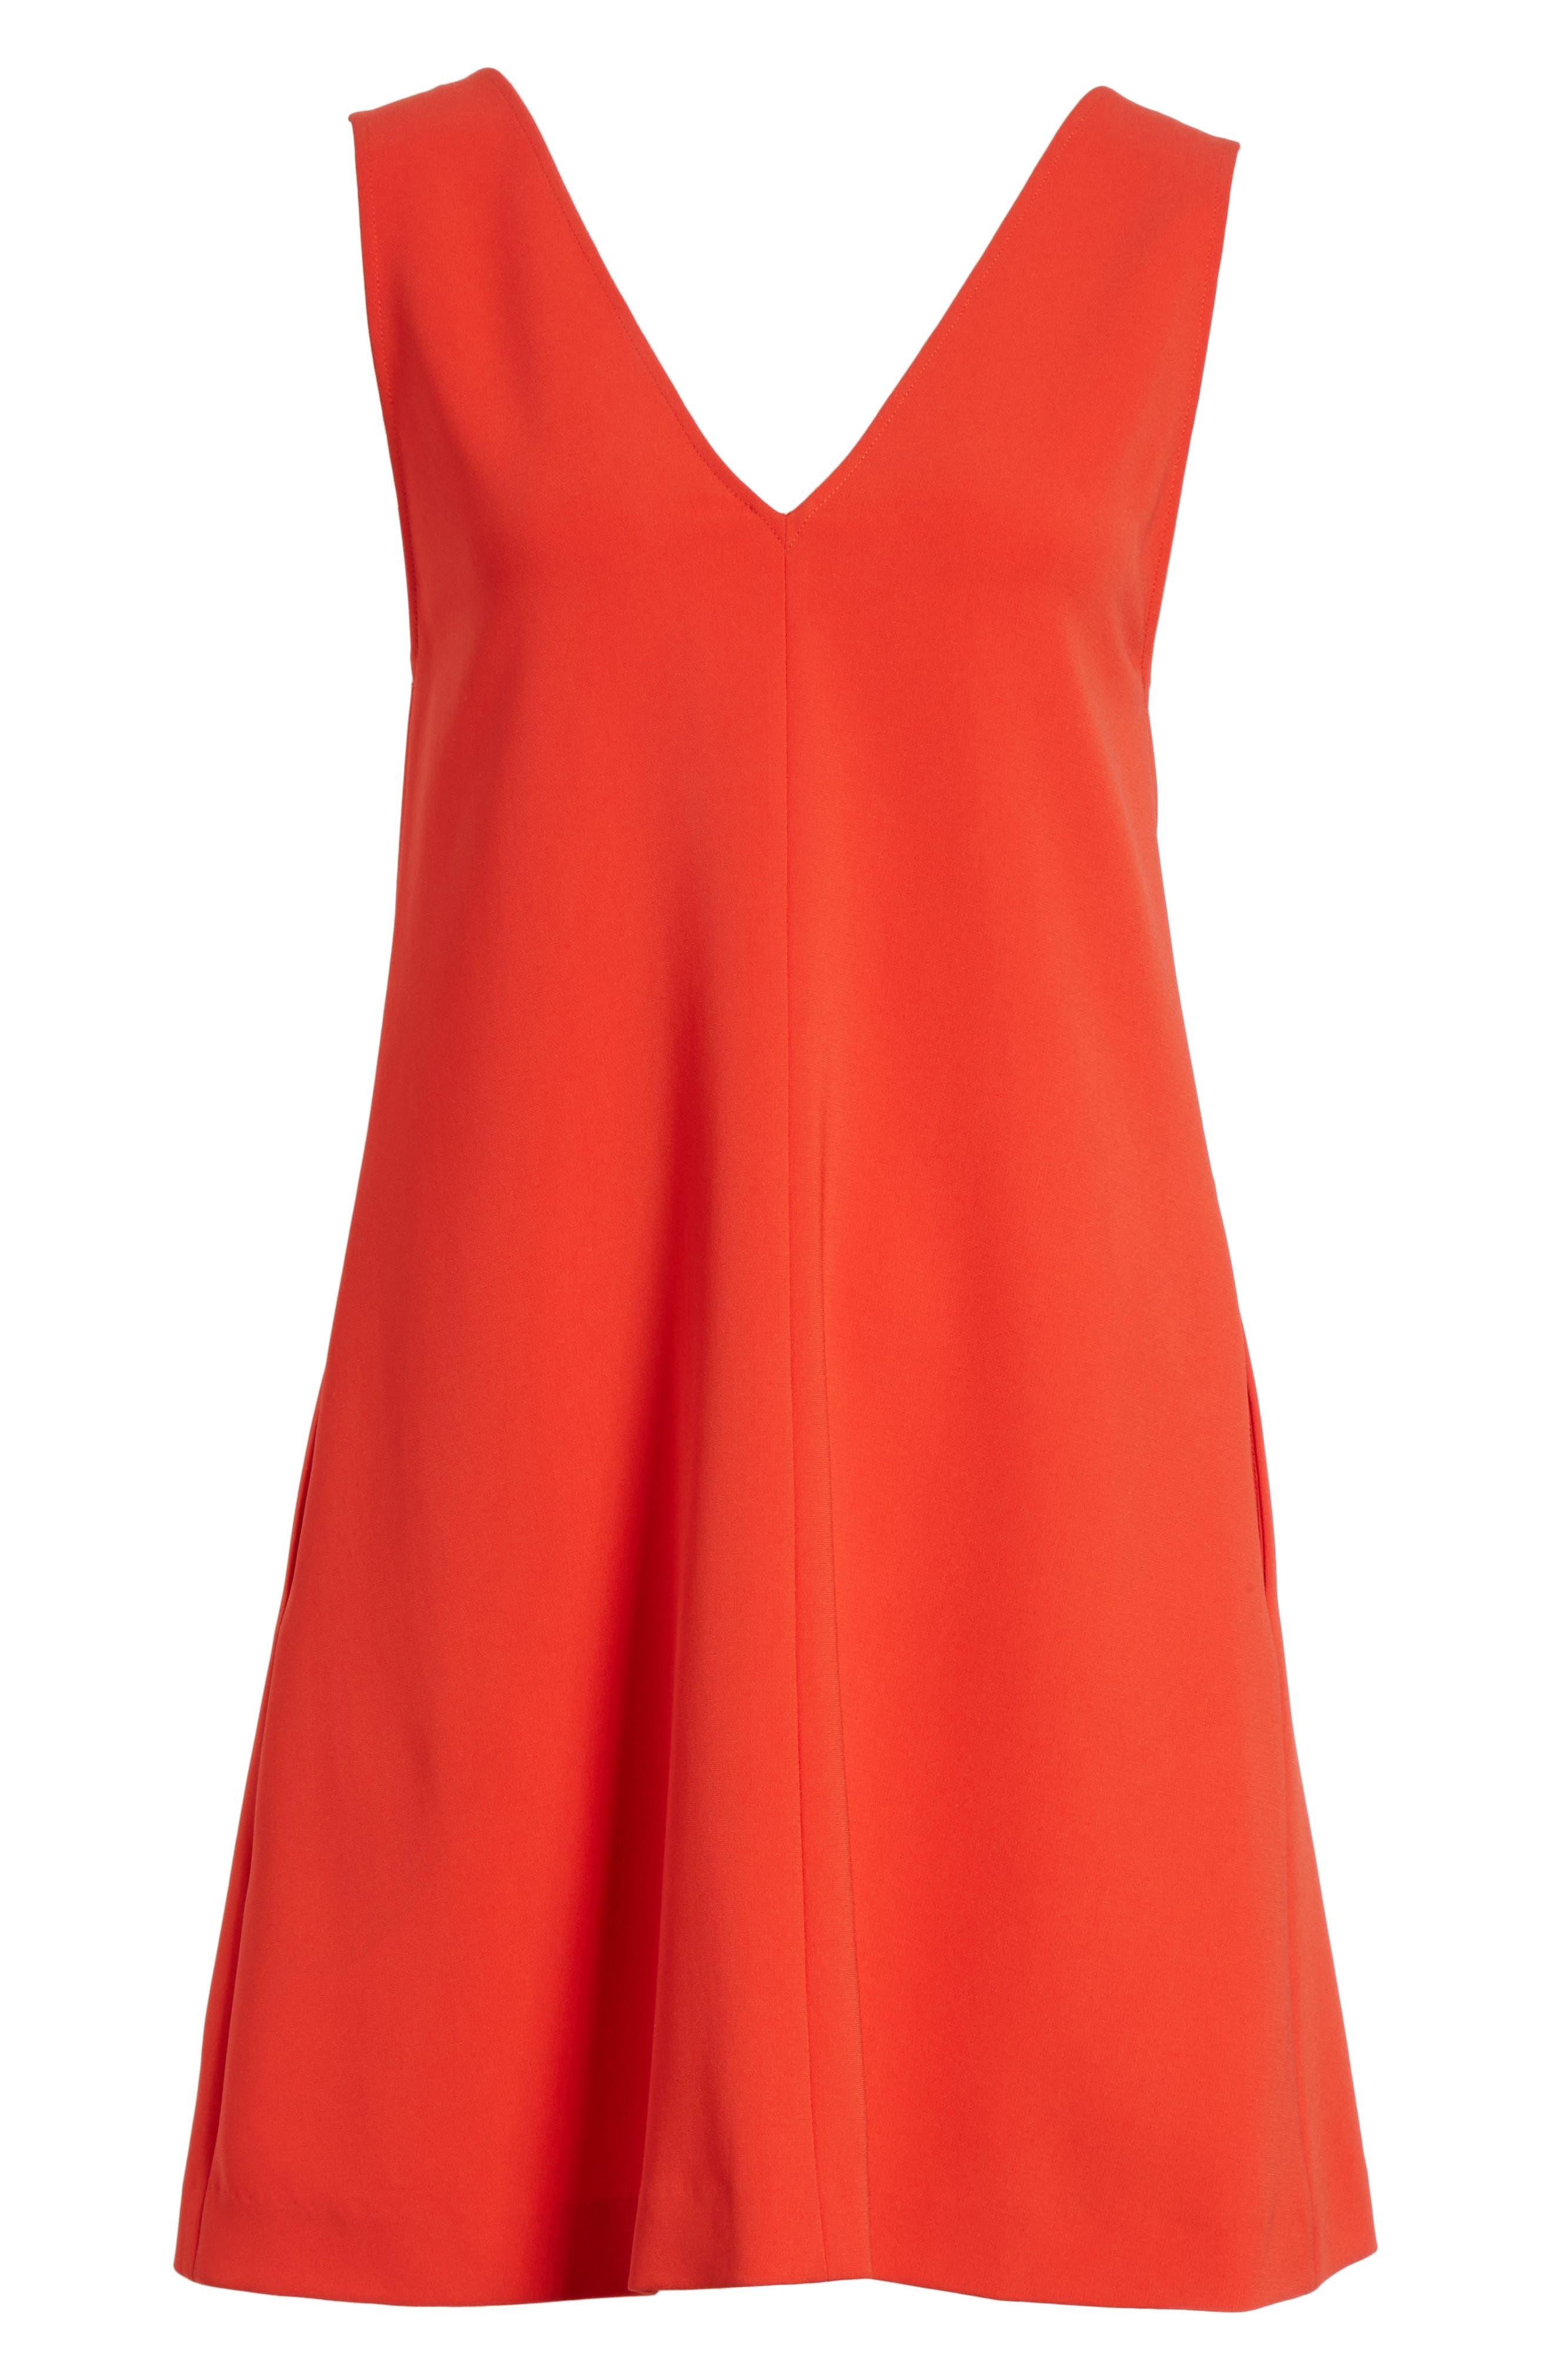 Admiral Crepe V-Neck Shift Dress,                             Alternate thumbnail 6, color,                             Bright Tomato